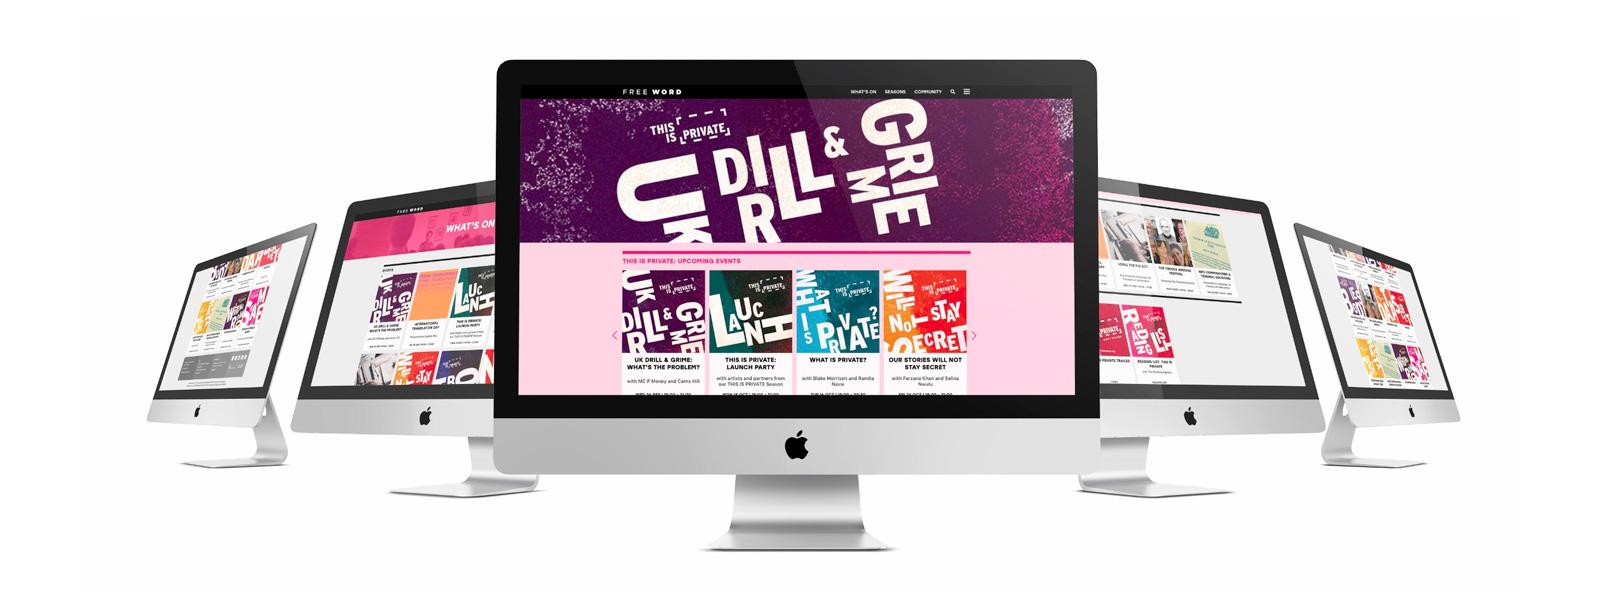 multiple monitors displaying website designs